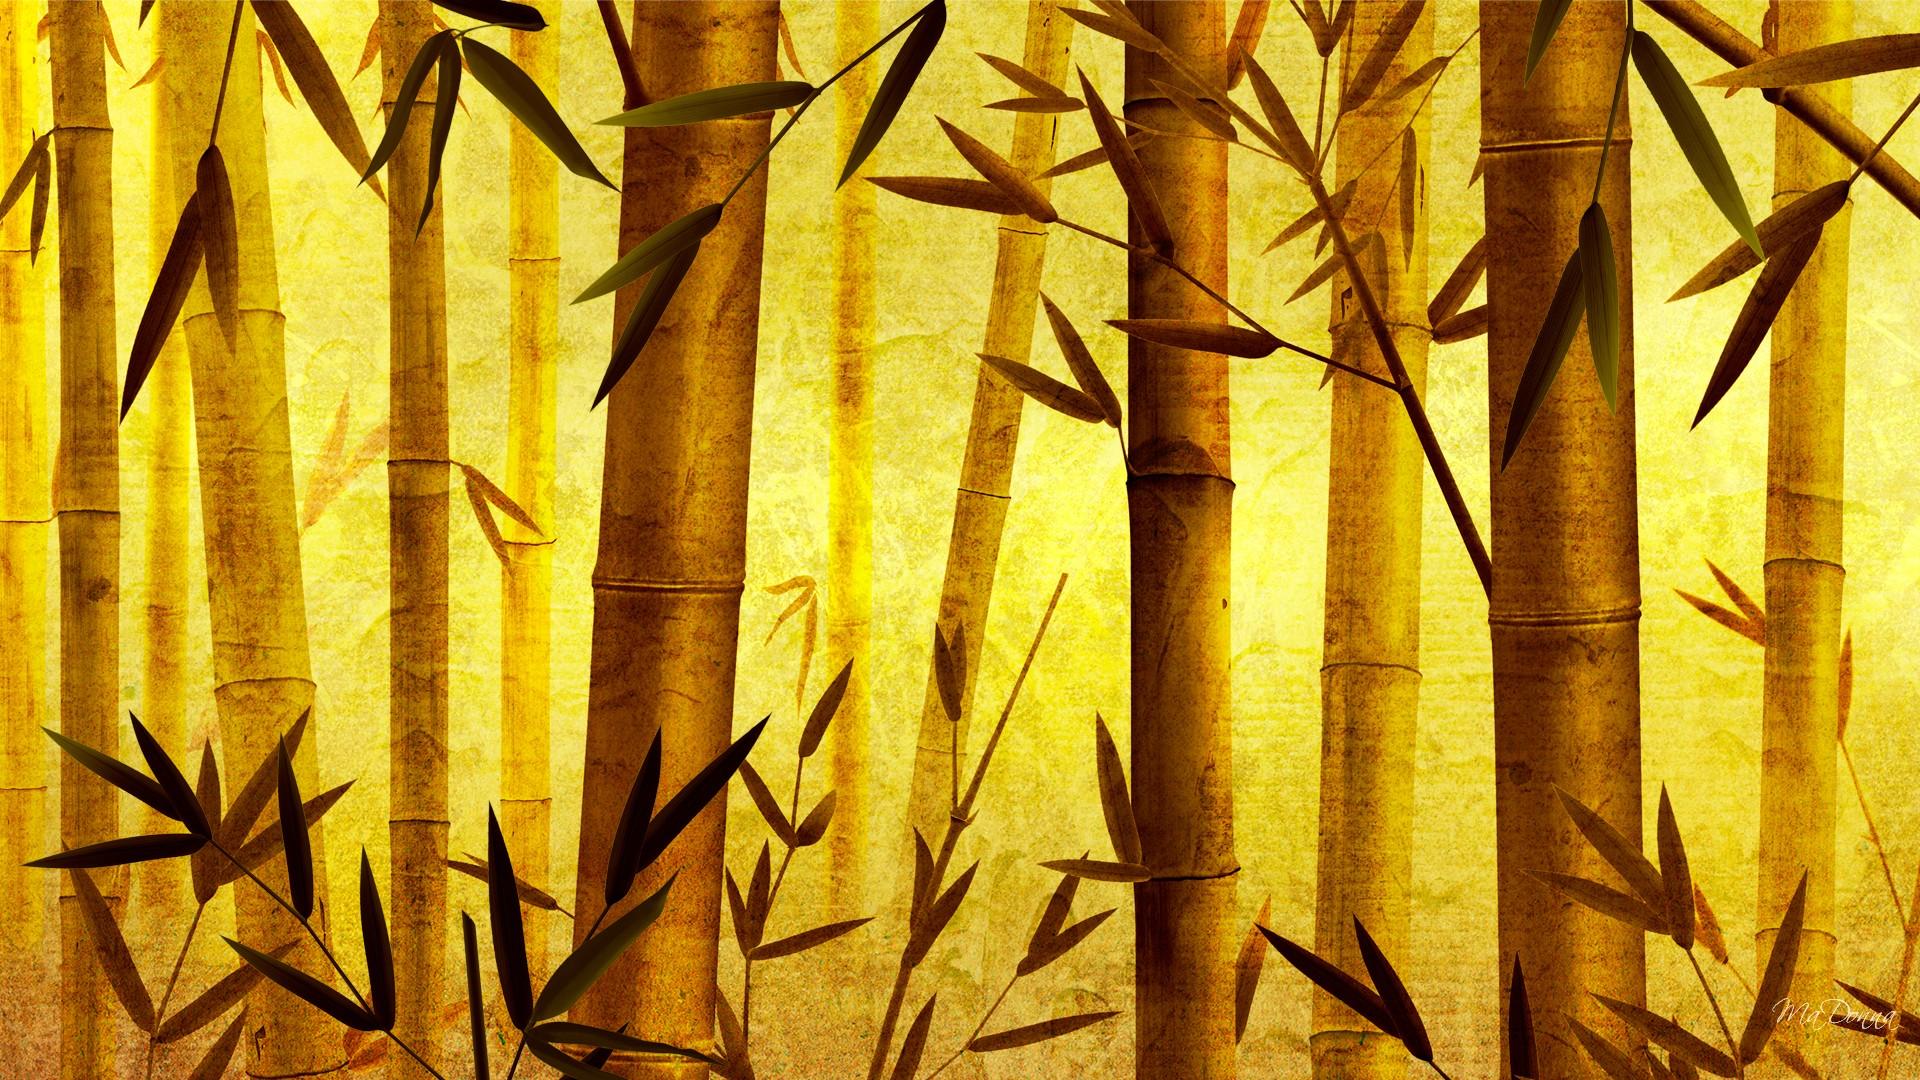 Wallpaper Cars Bamboo Wallpaper Background Hd Desktop Wallpapers 4k Hd